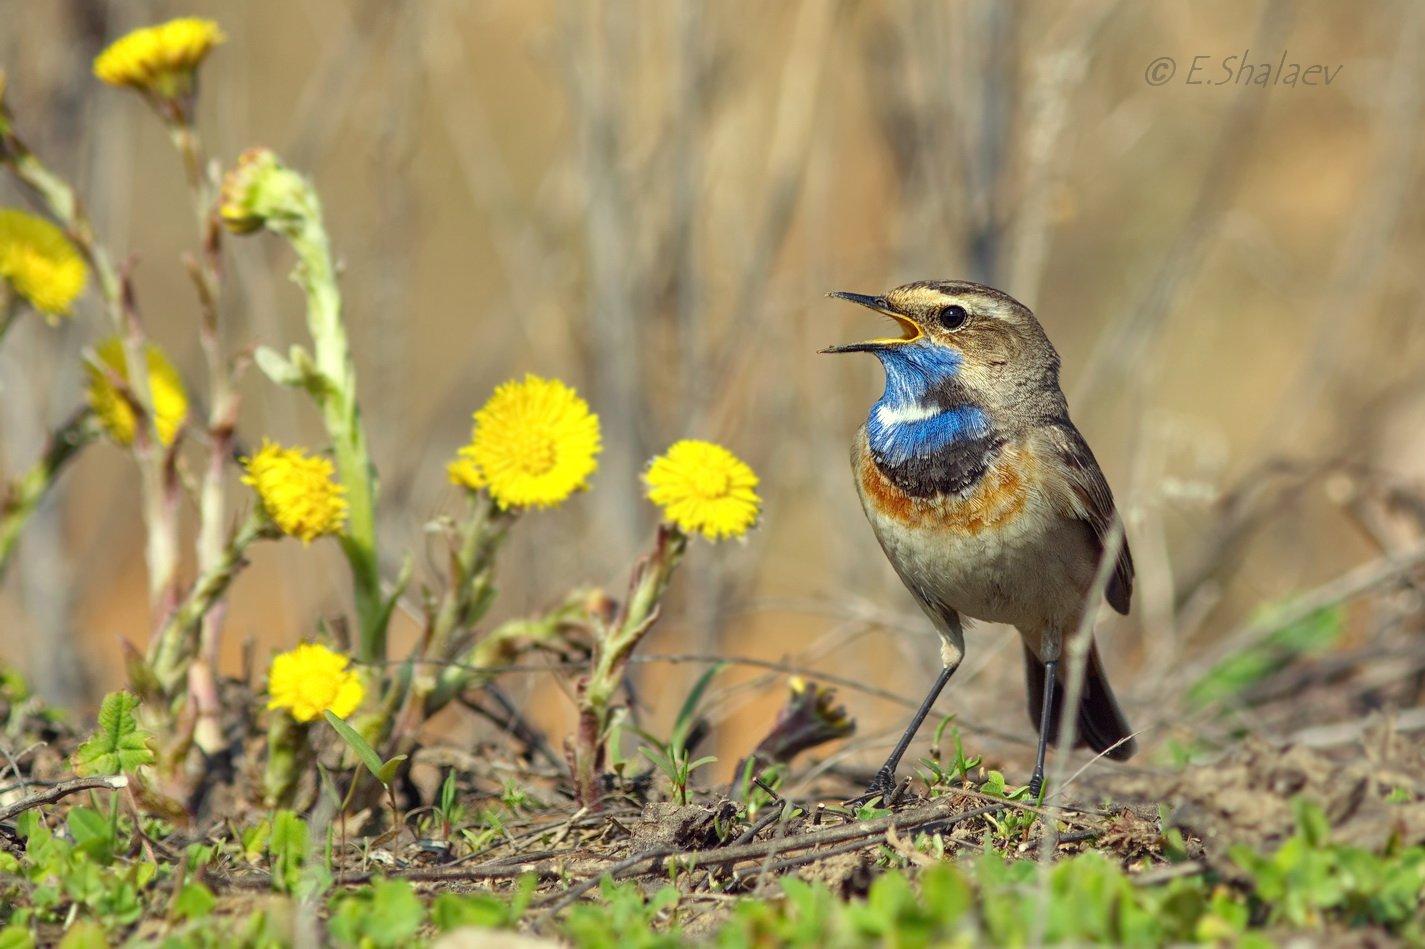 Birds, Bluethroat, Luscinia svecica, Варакушка, Птица, Птицы, Фотоохота, Евгений